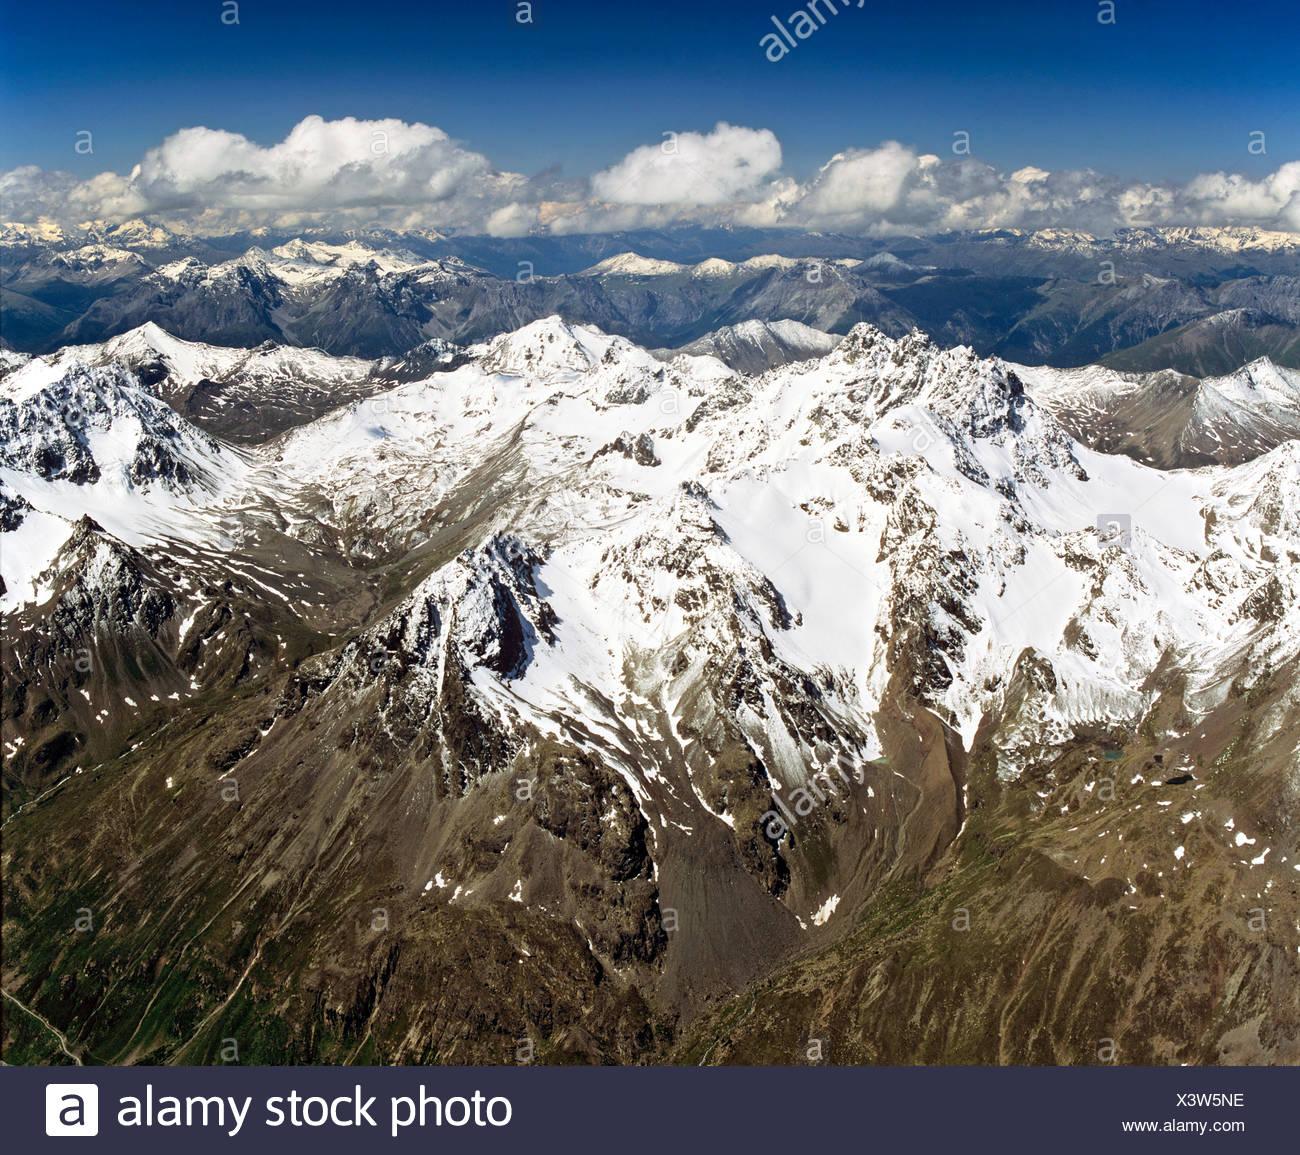 Dreilaenderspitze, left hand Fluchthorn, Silvretta, Tyrol, Austria - Stock Image